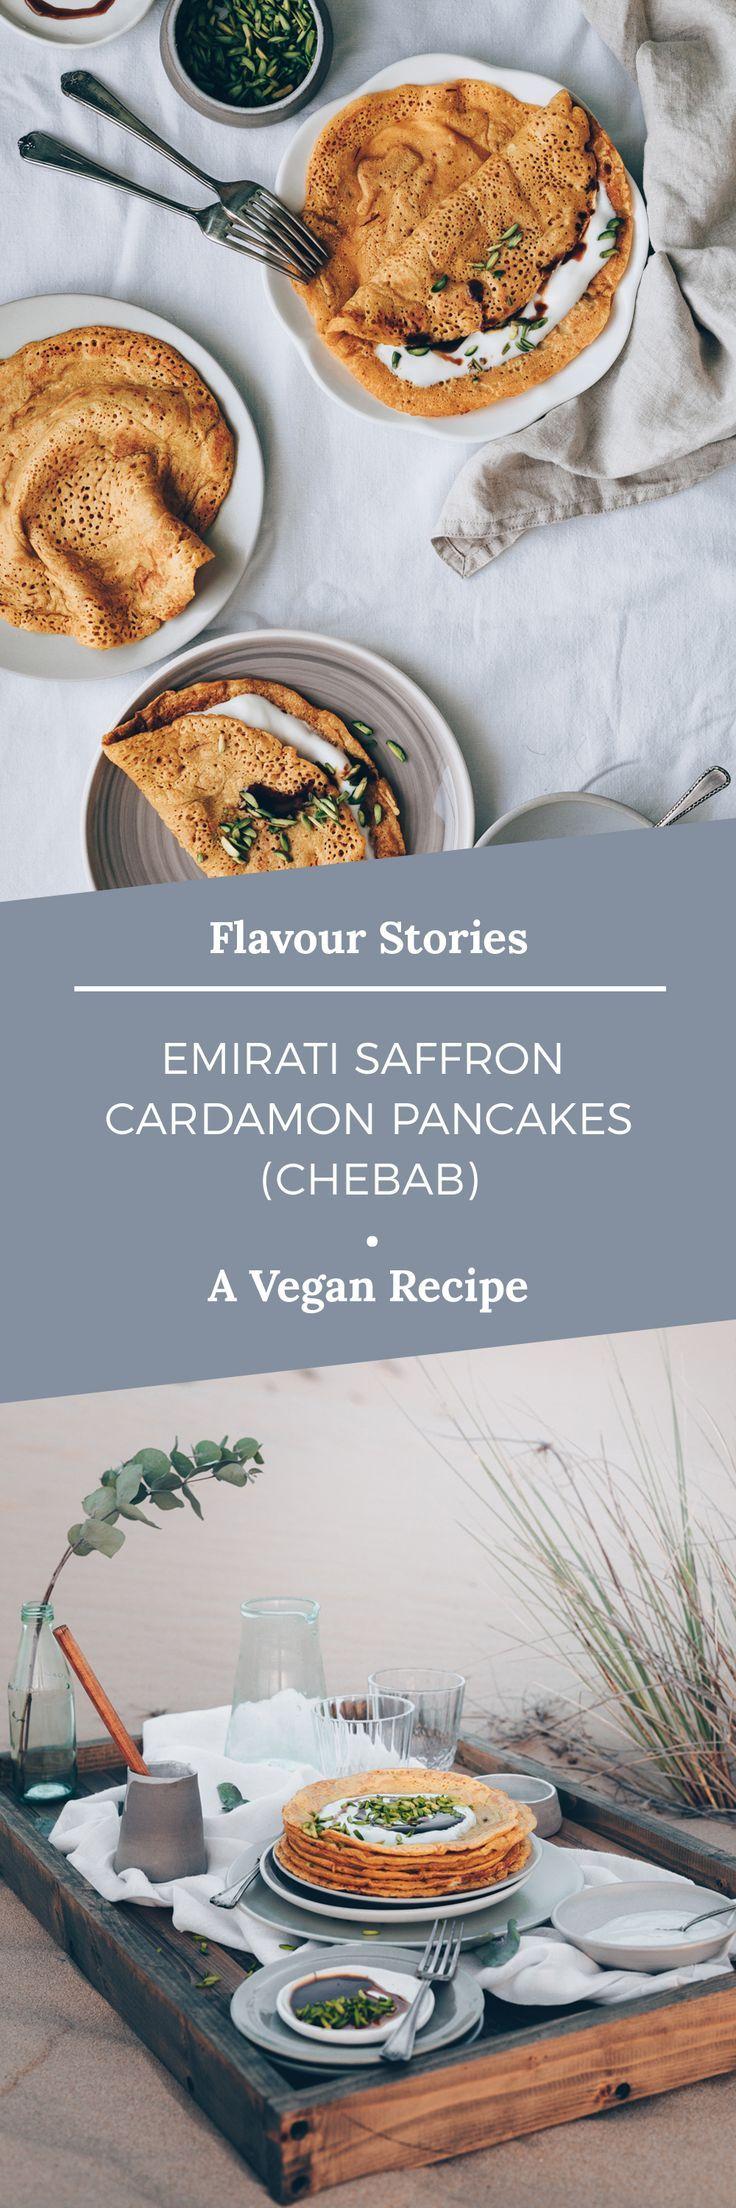 EMIRATI SAFFRON CARDAMON PANCAKES (Chebab)   - Blogger - Frühstück mal anders -